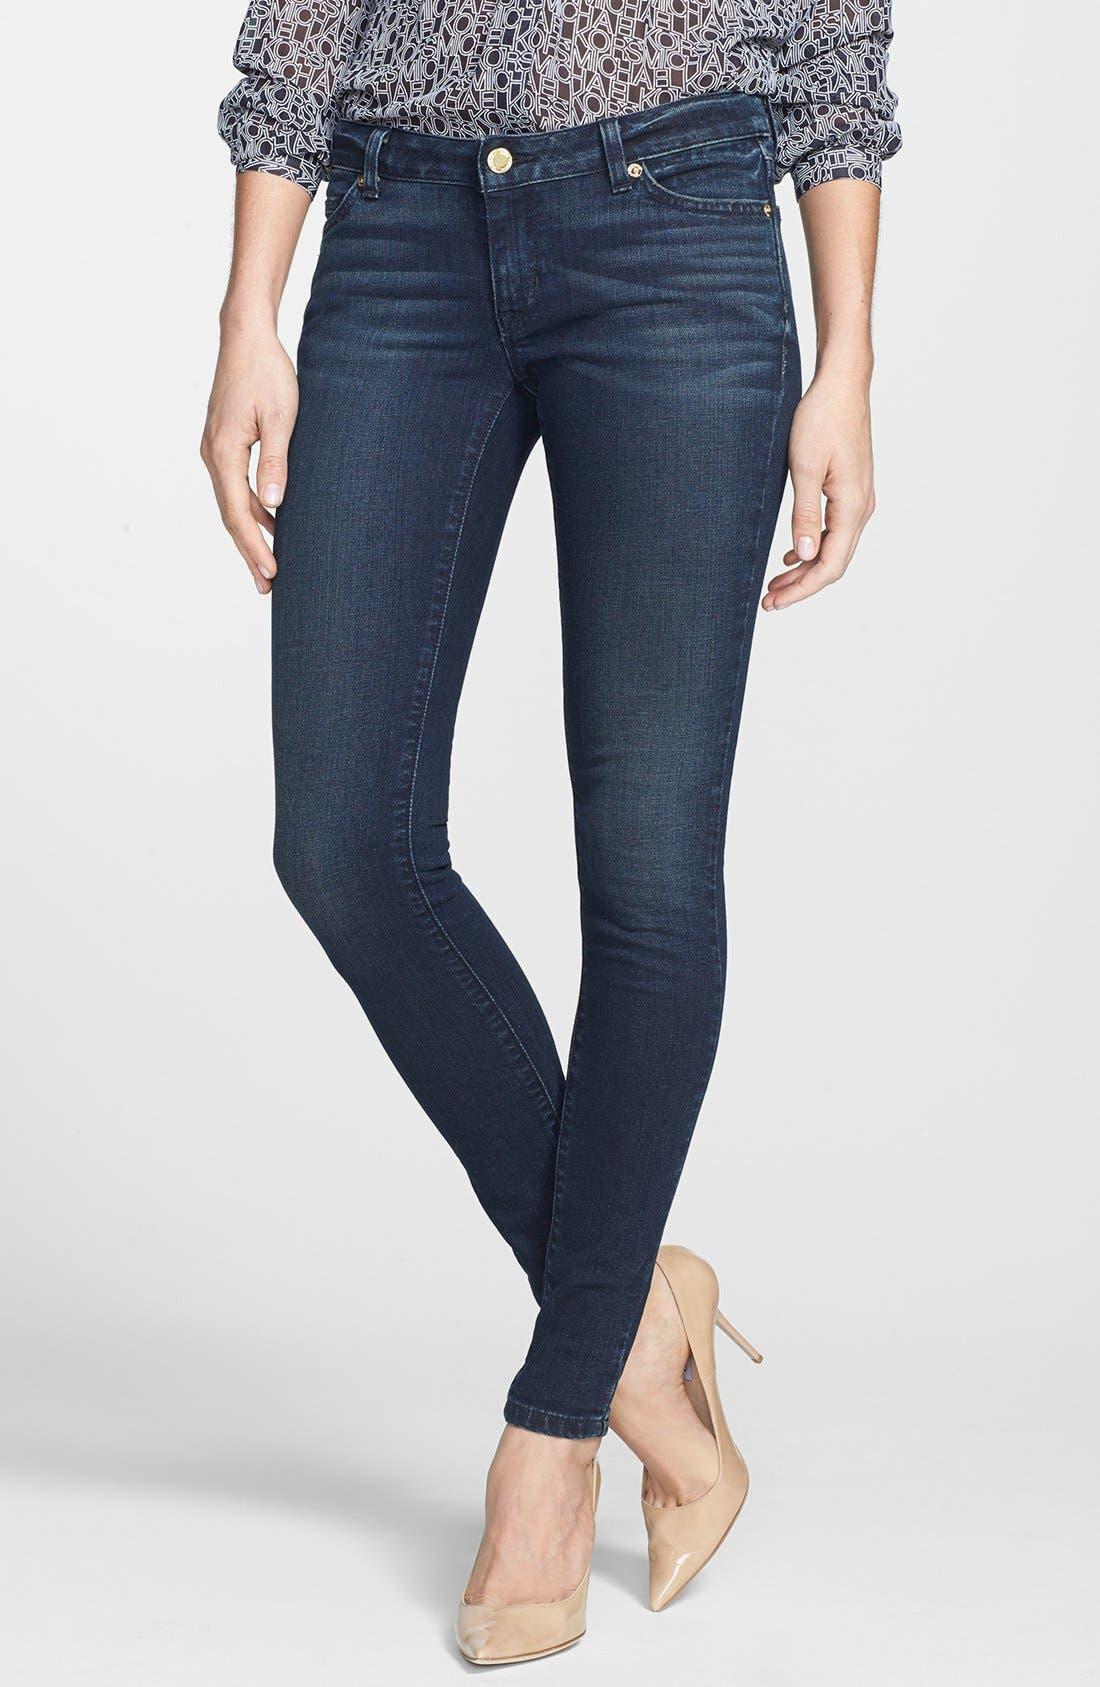 Main Image - MICHAEL Michael Kors 'Jetset' Stretch Skinny Jeans (Stellar)